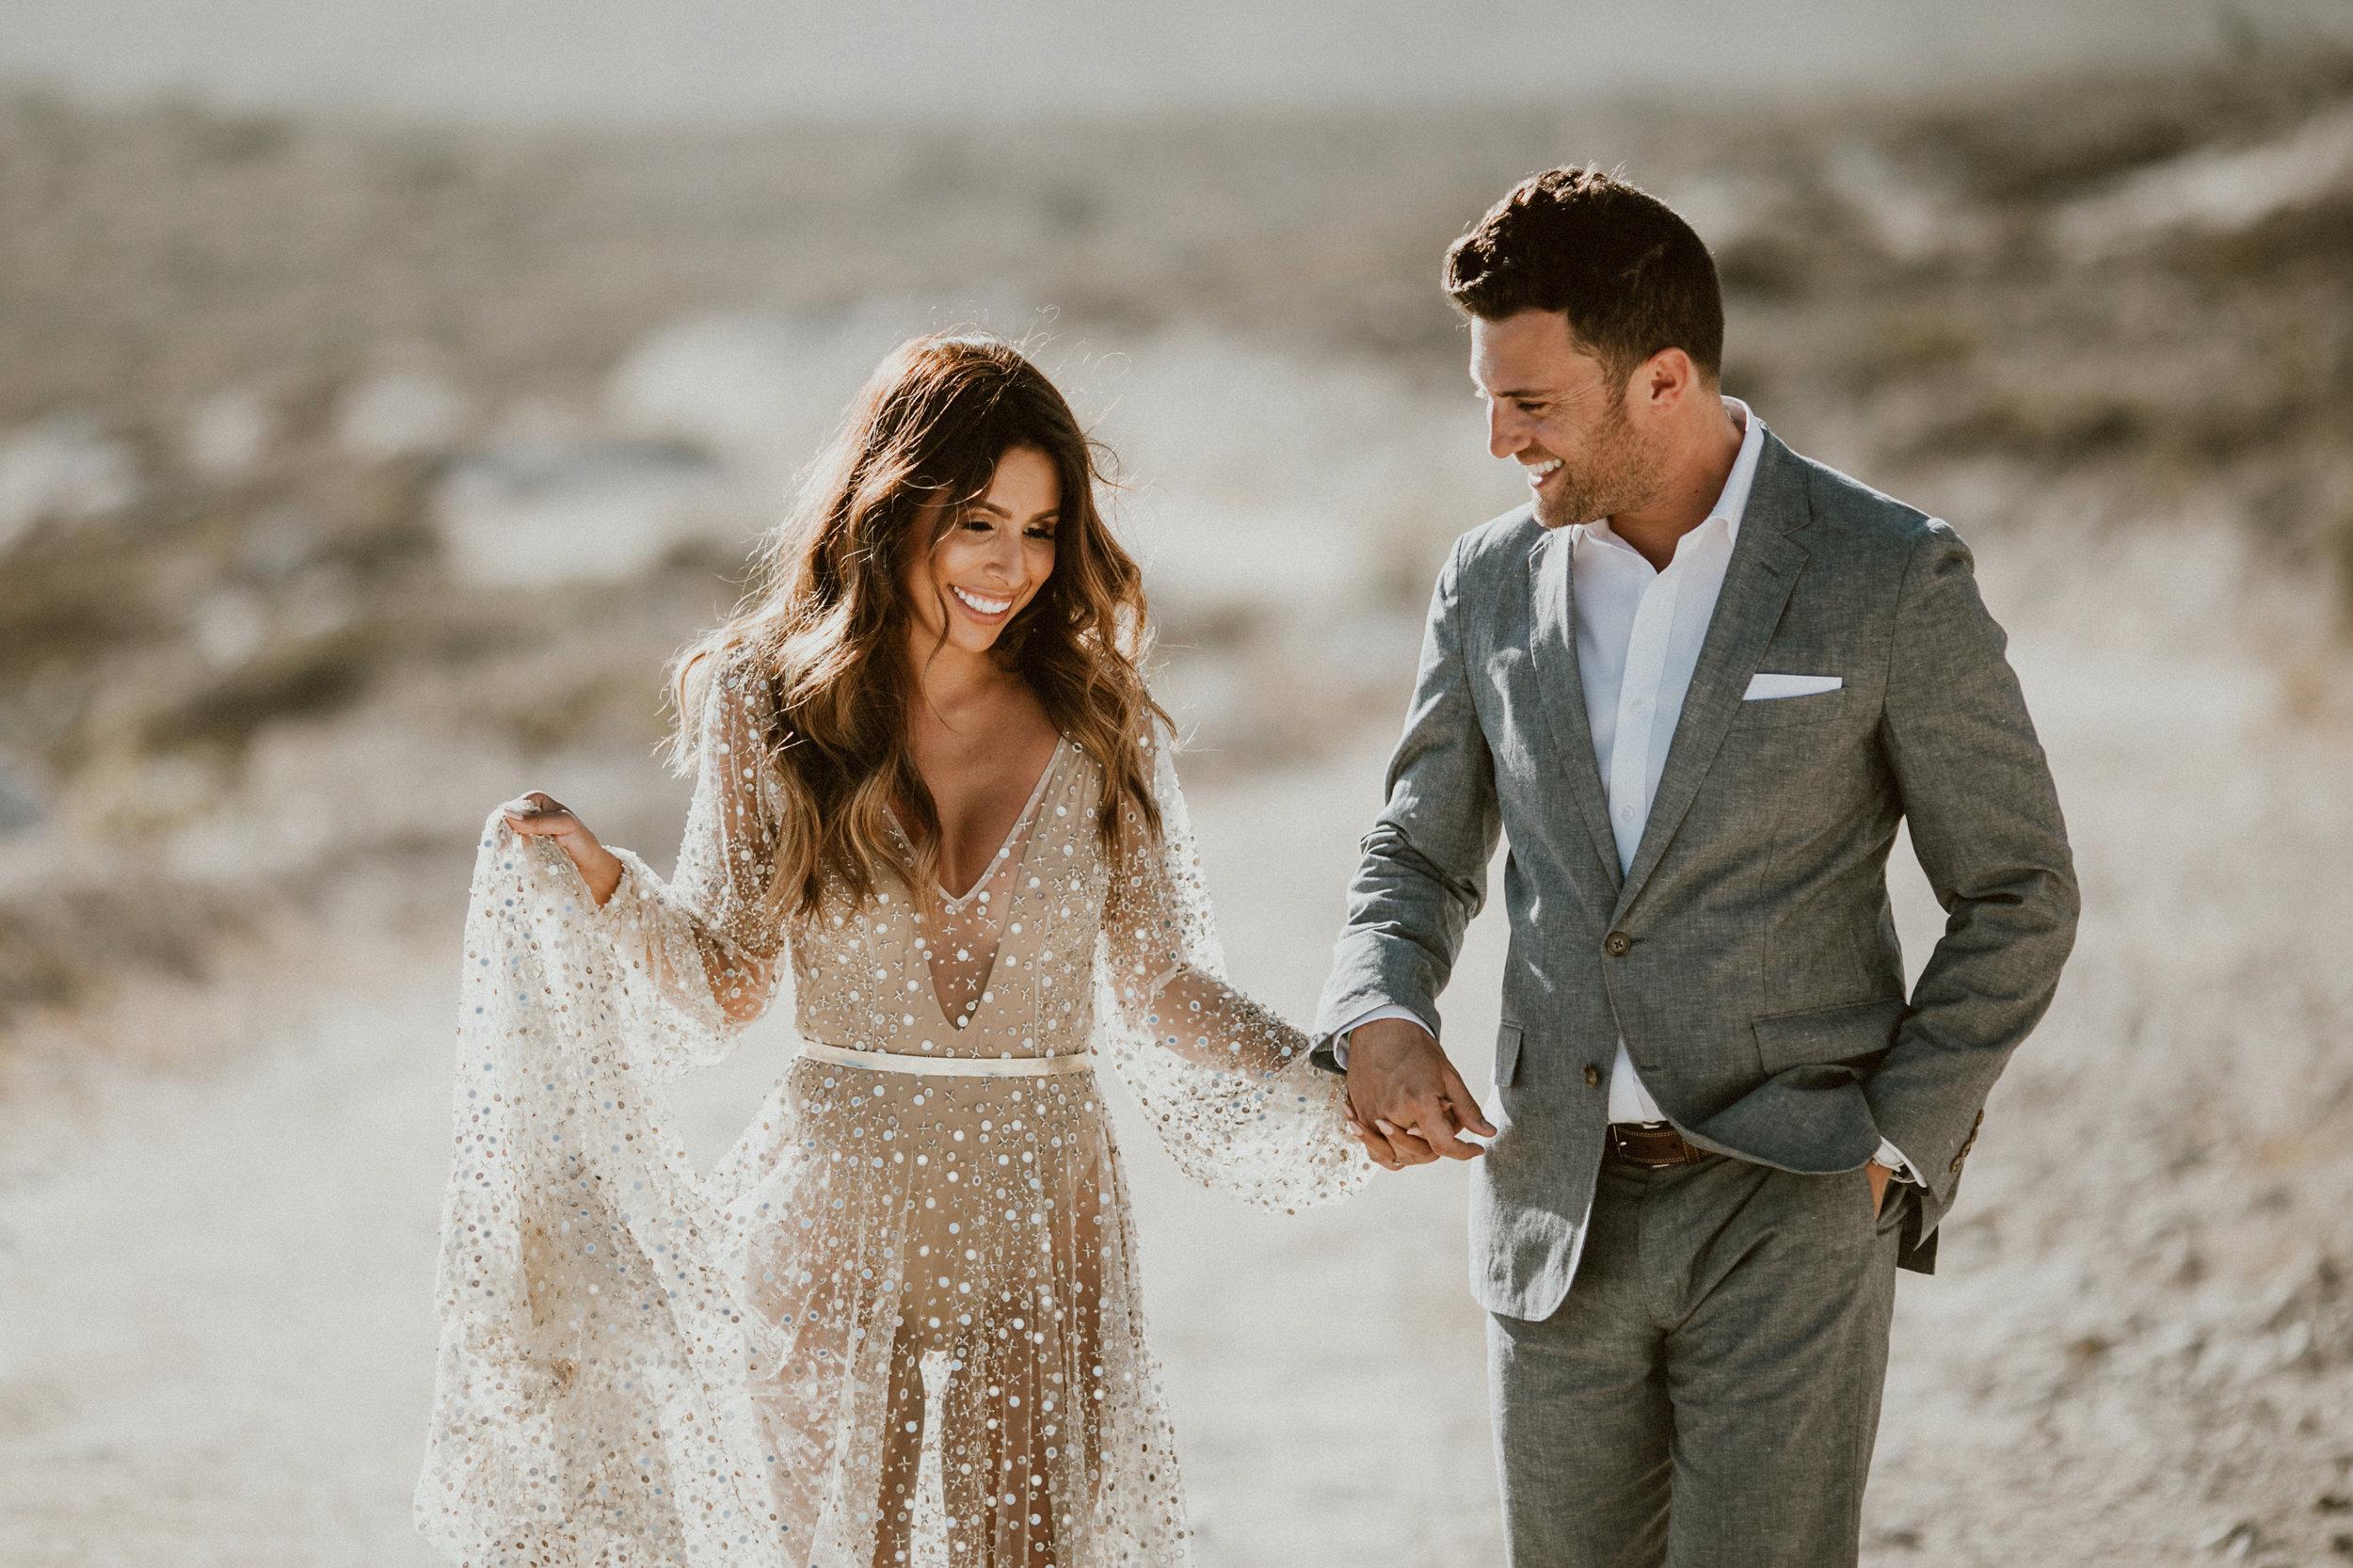 Post Wedding Photoshoot Ideas - Glamorous Beach Shoot in Los Cabos, Mexico   Gina + Ryan Photo